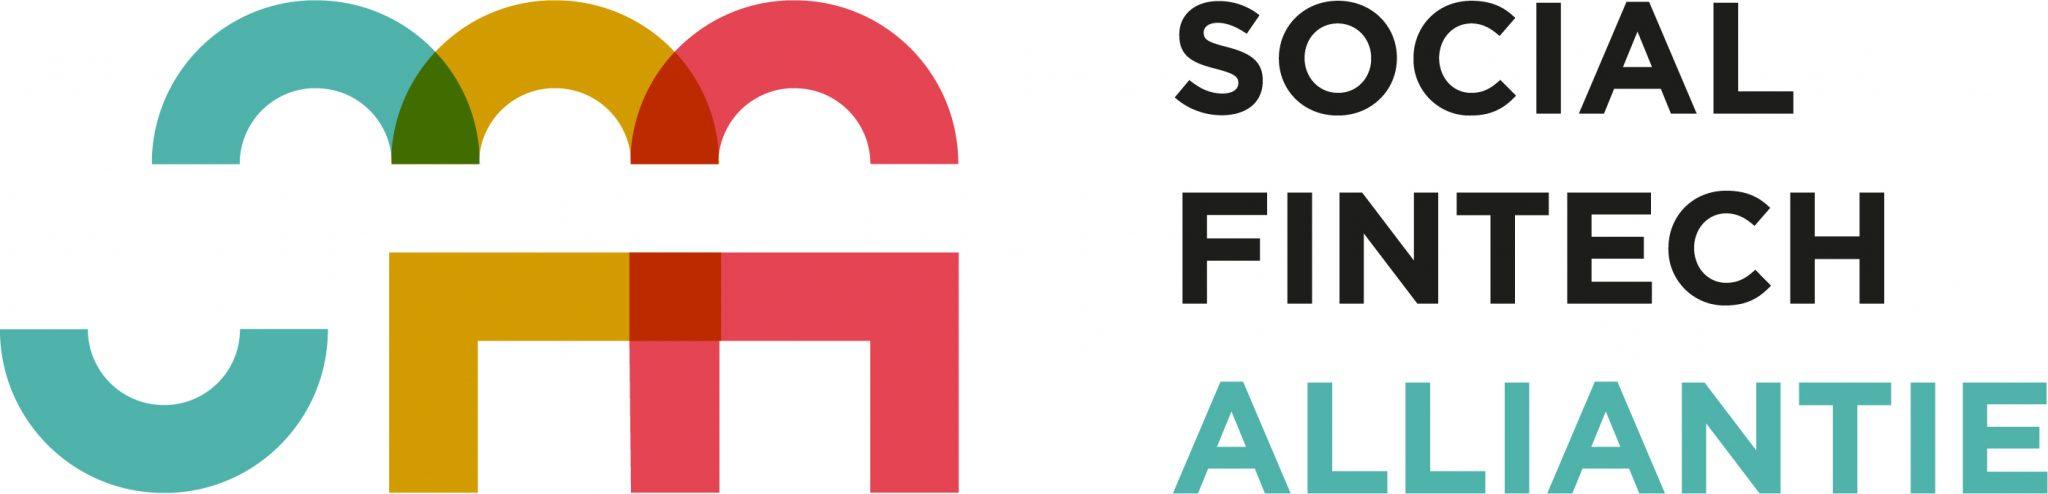 Social Fintech Alliantie